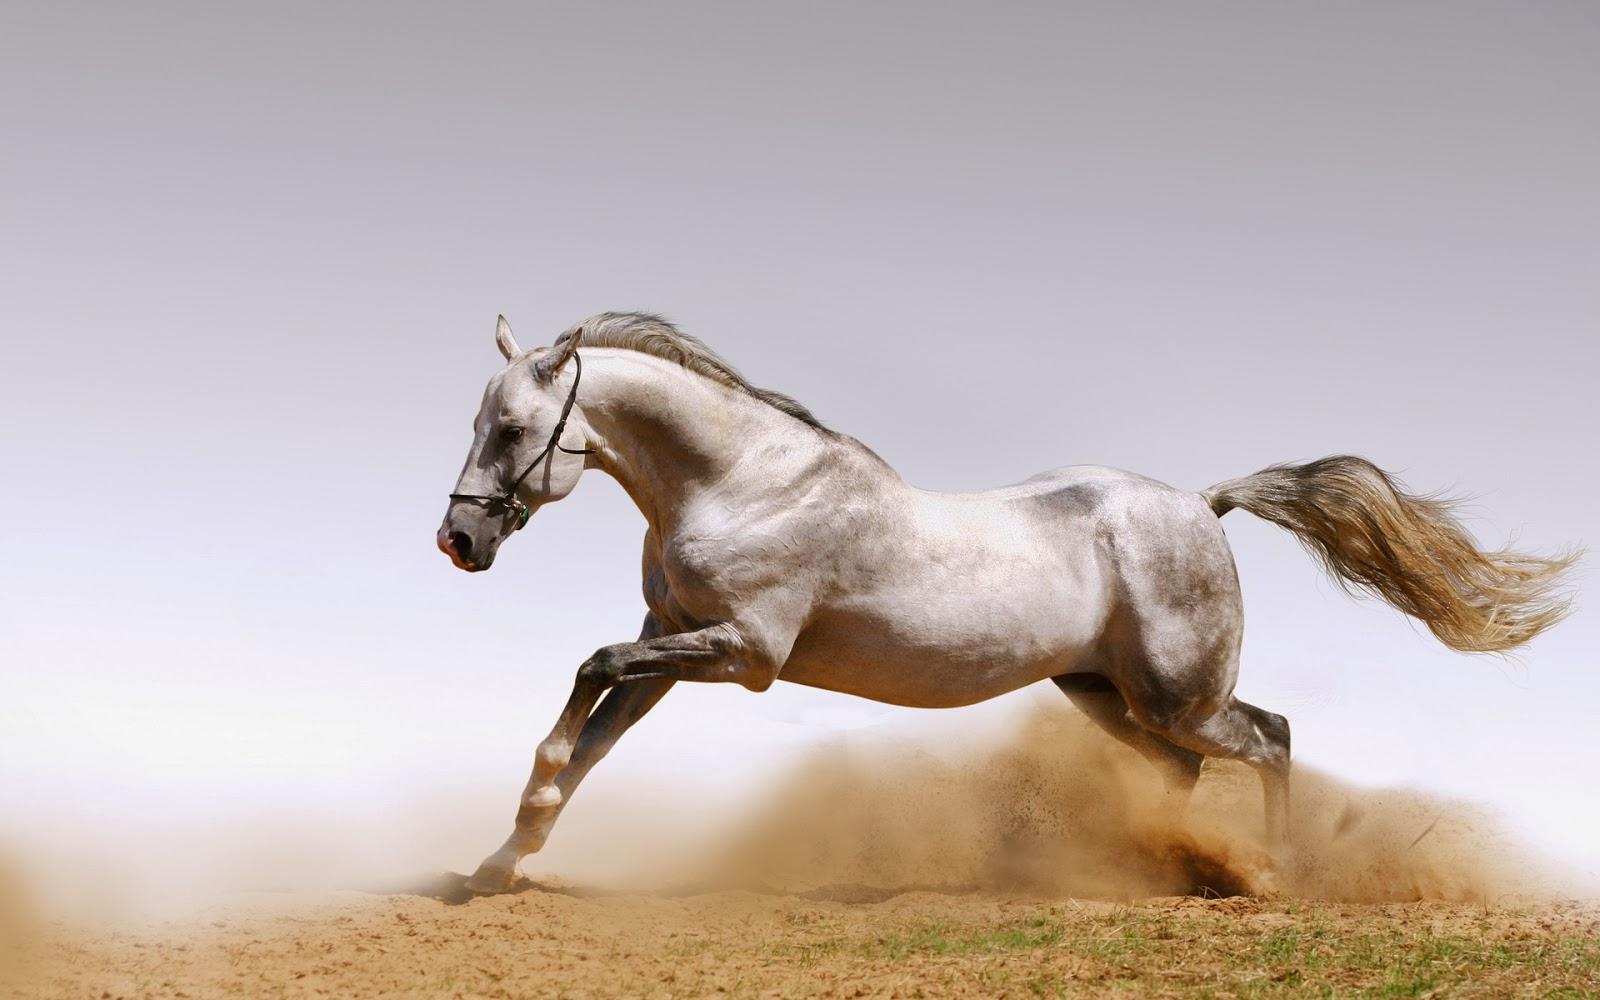 beautiful animal wallpapers,horse,mammal,vertebrate,stallion,mane